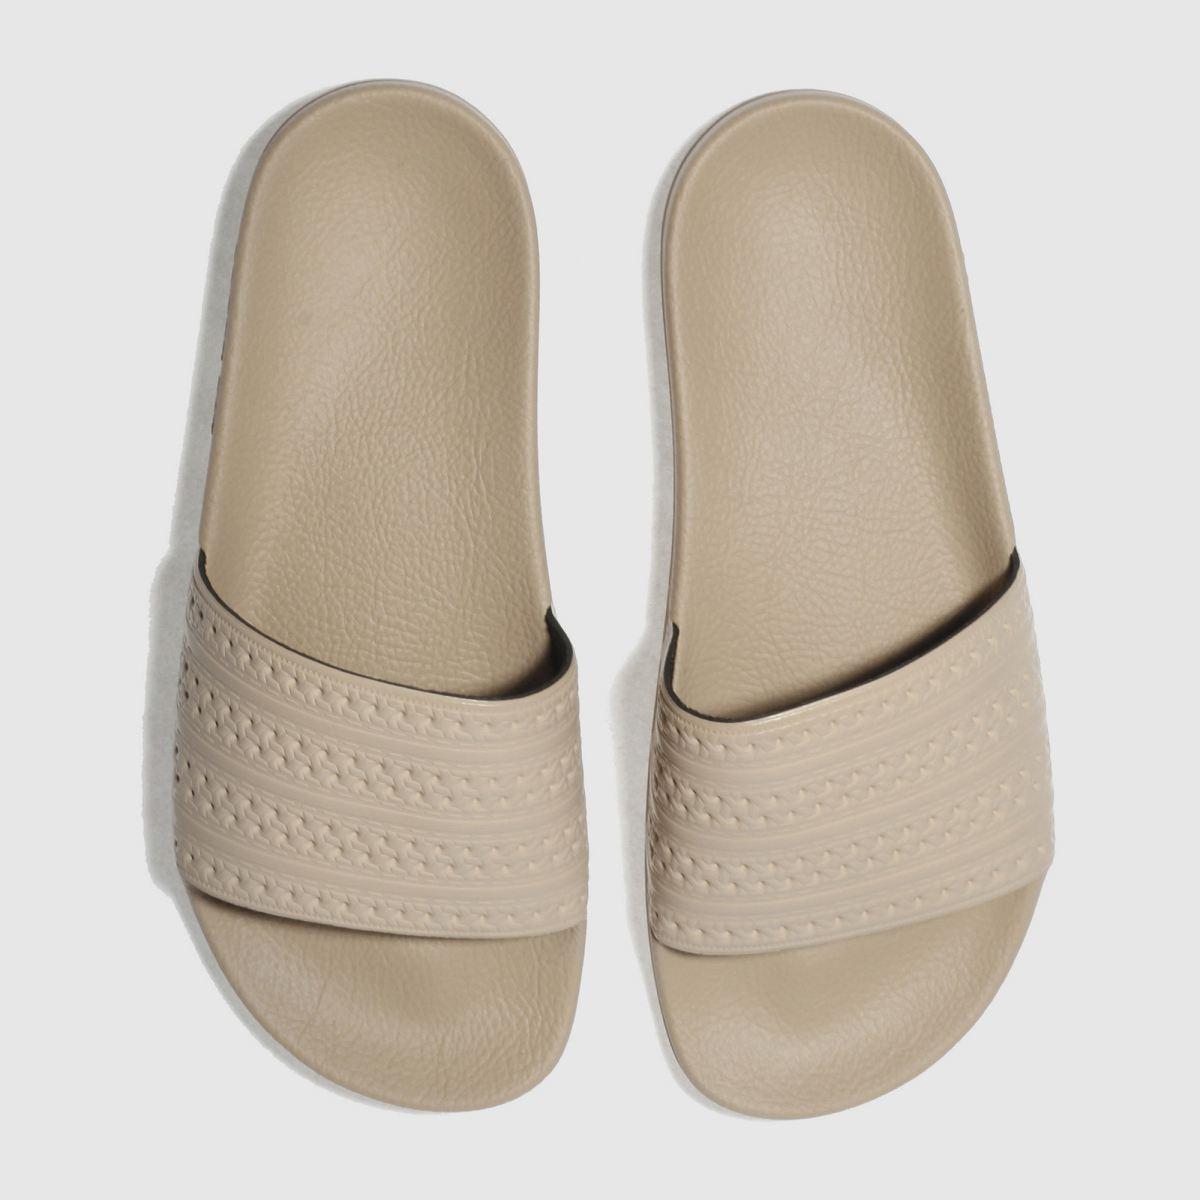 Adidas Natural Adilette Slide Sandals